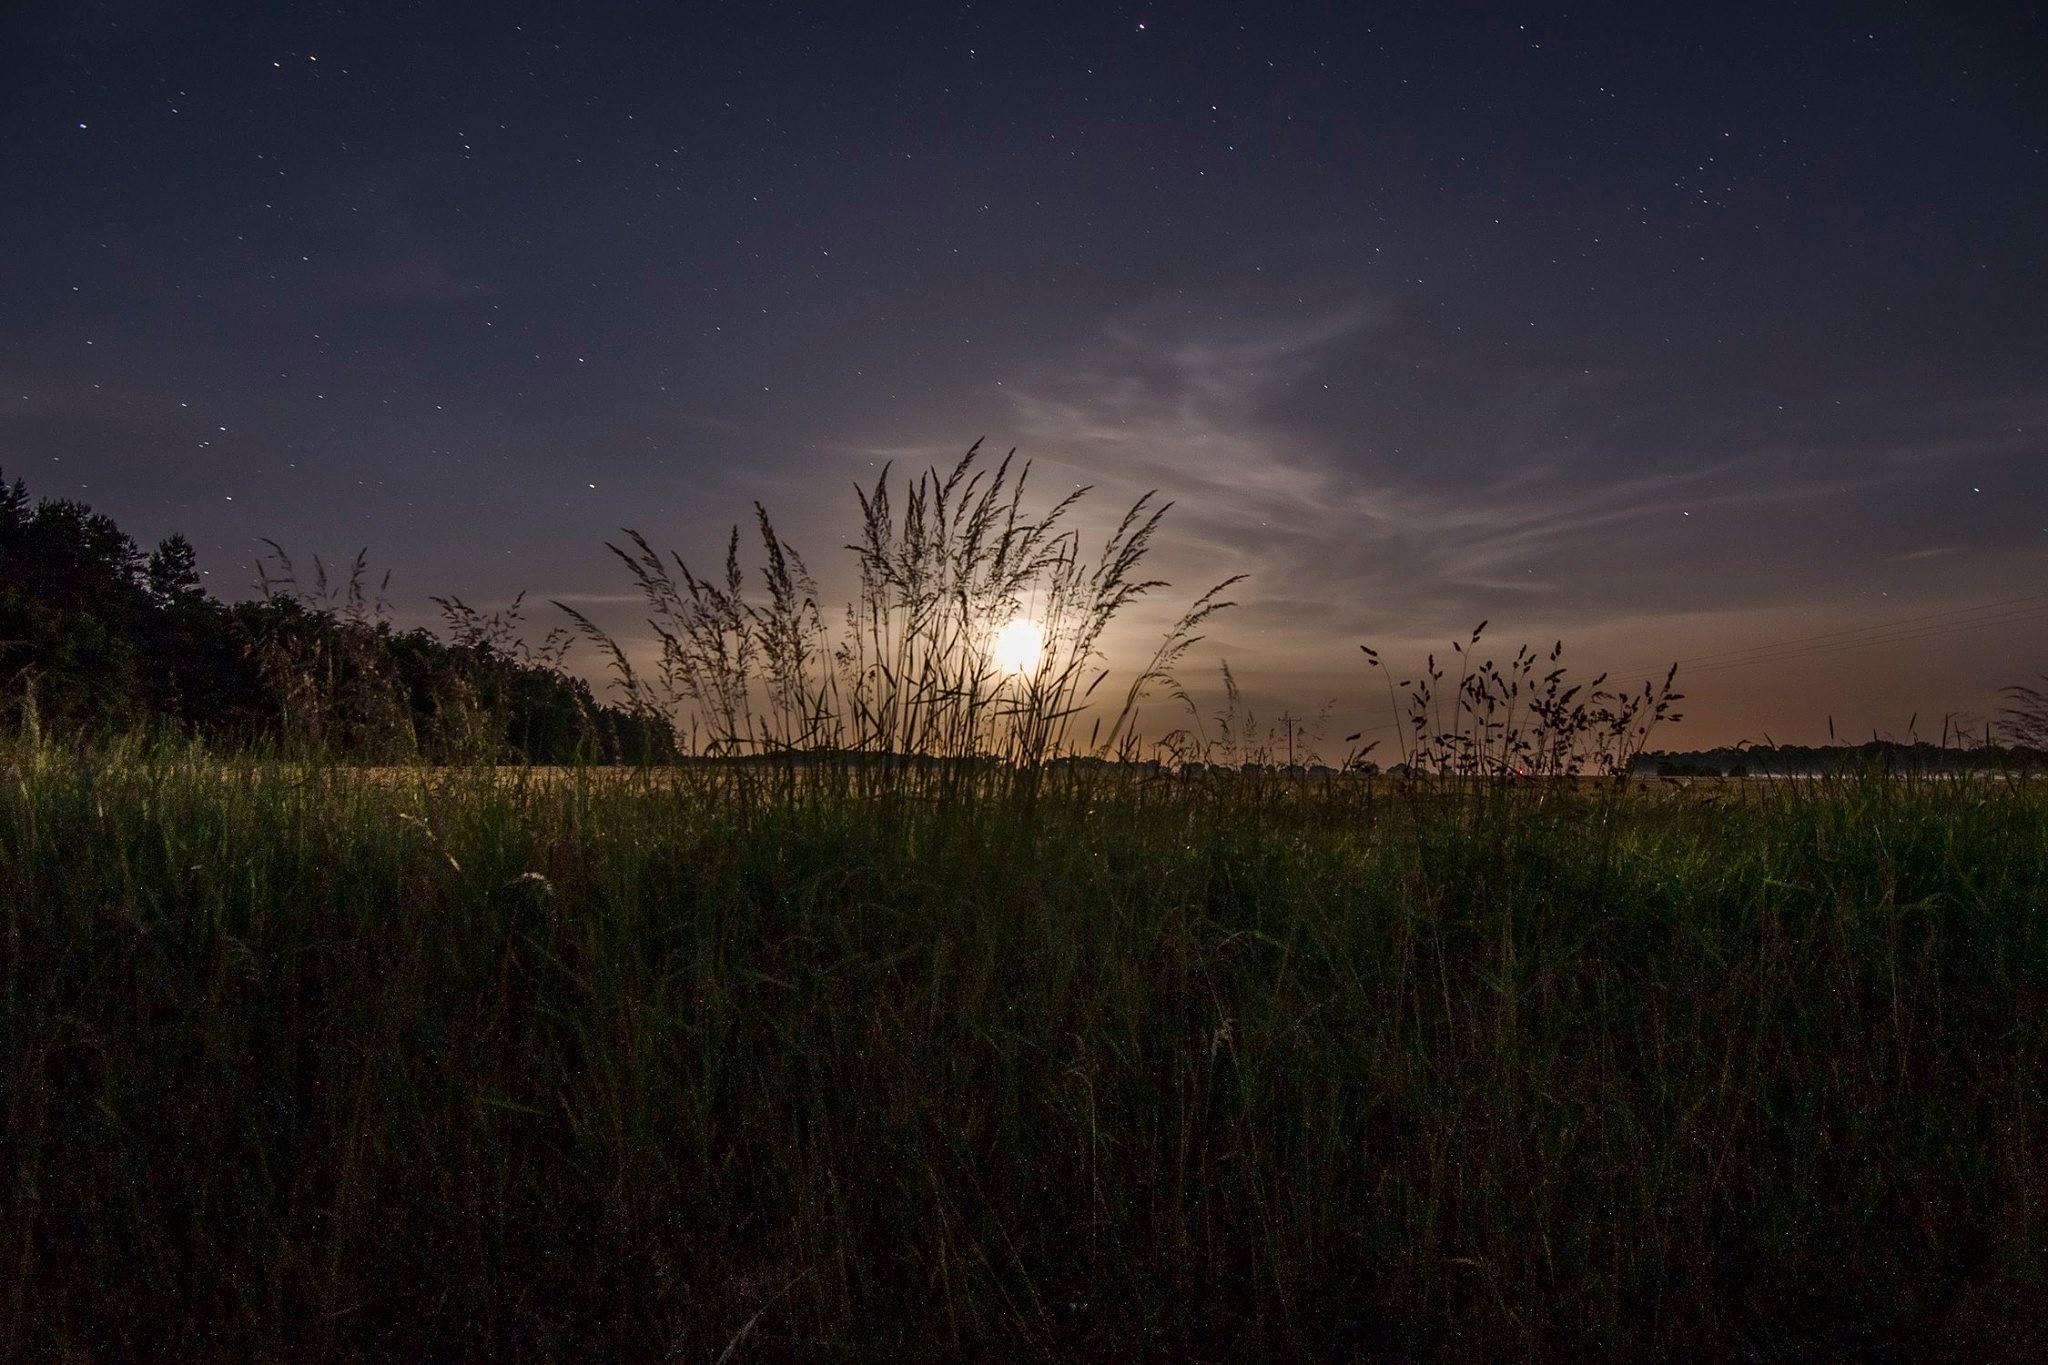 Moonlit Night. by Waldemar Sadlowski